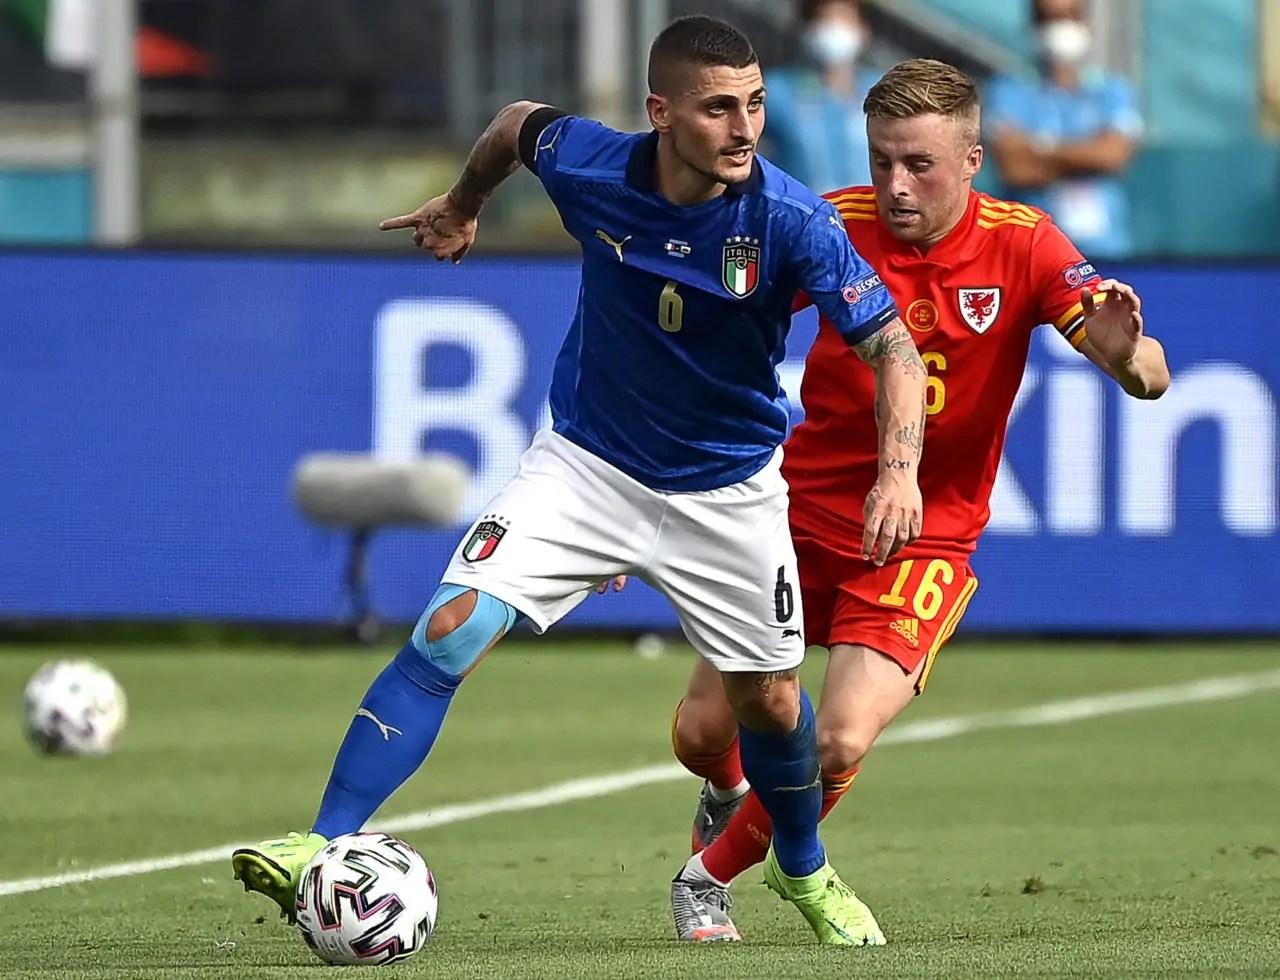 Euro 2020: Italy vs. Austria probable line-ups - Football Italia